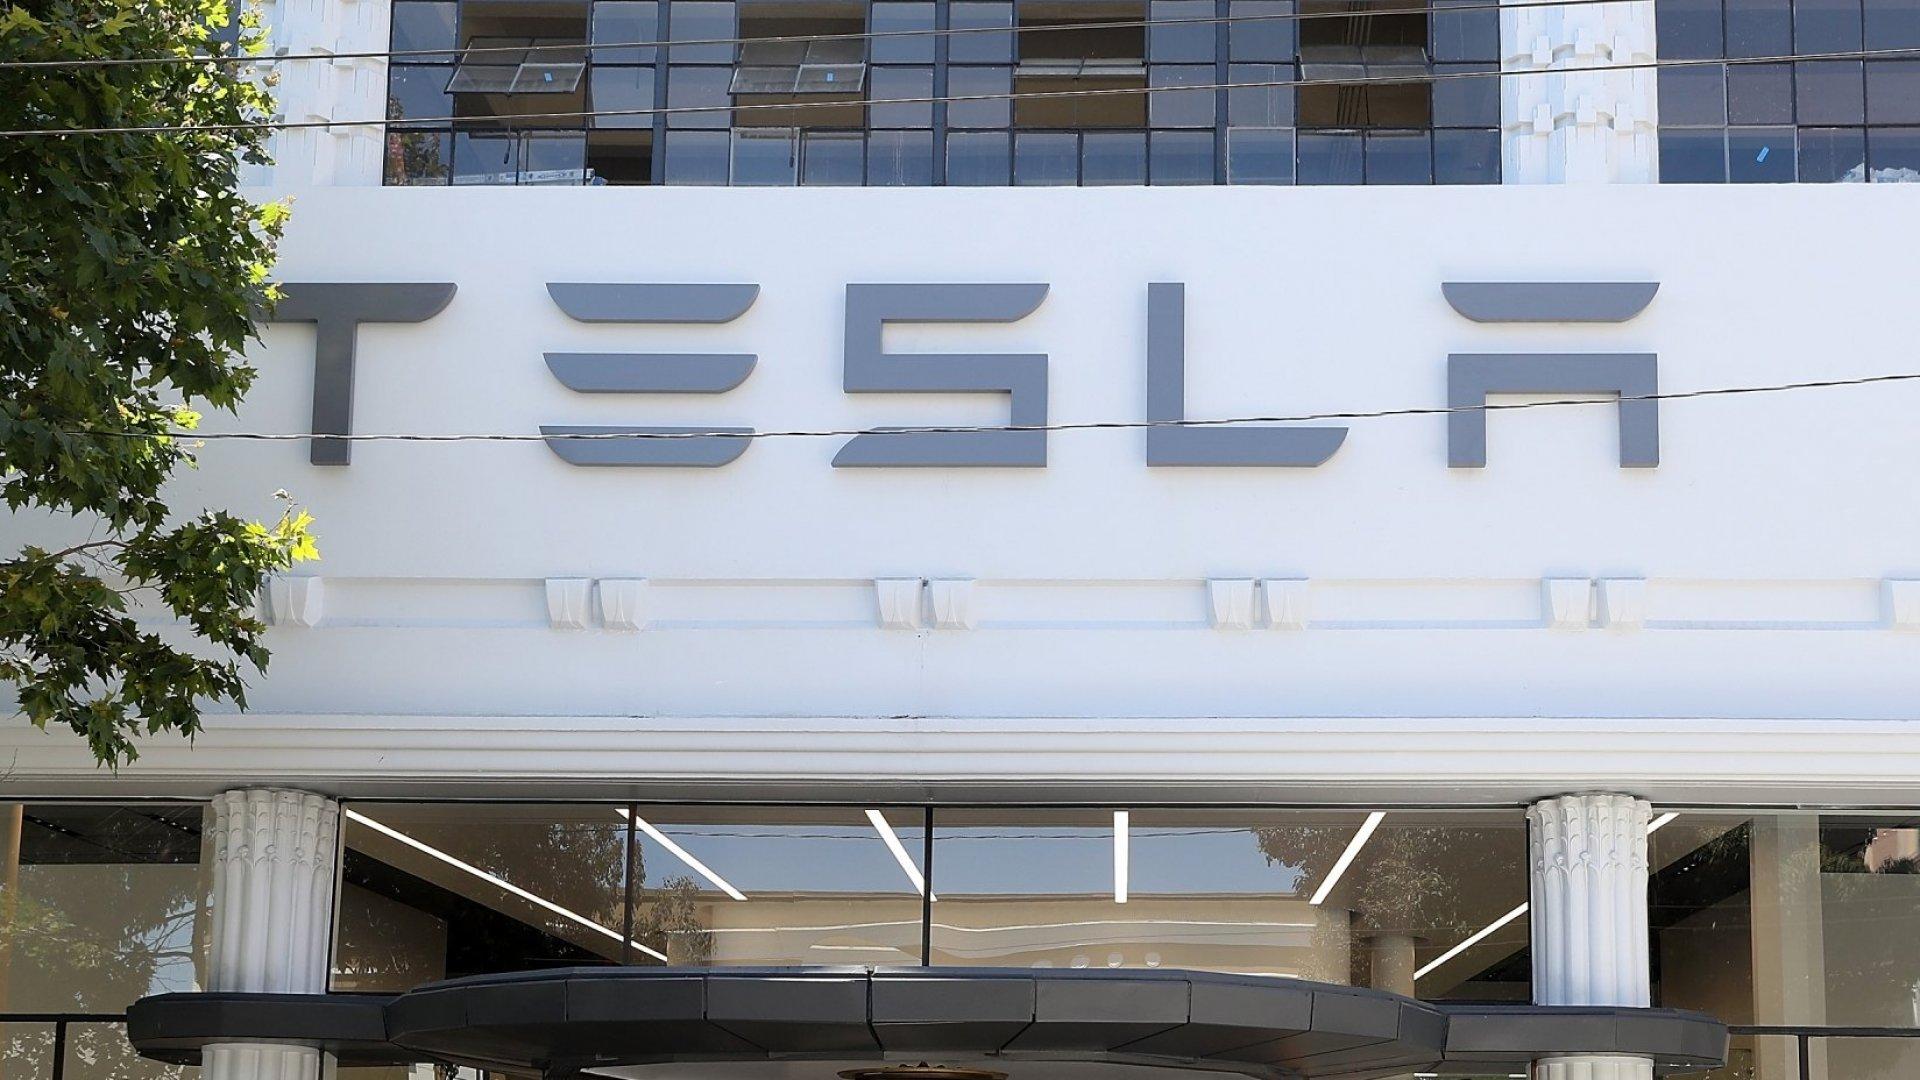 Elon Musk Unveils New Solar-Powered Glass Roof Tiles